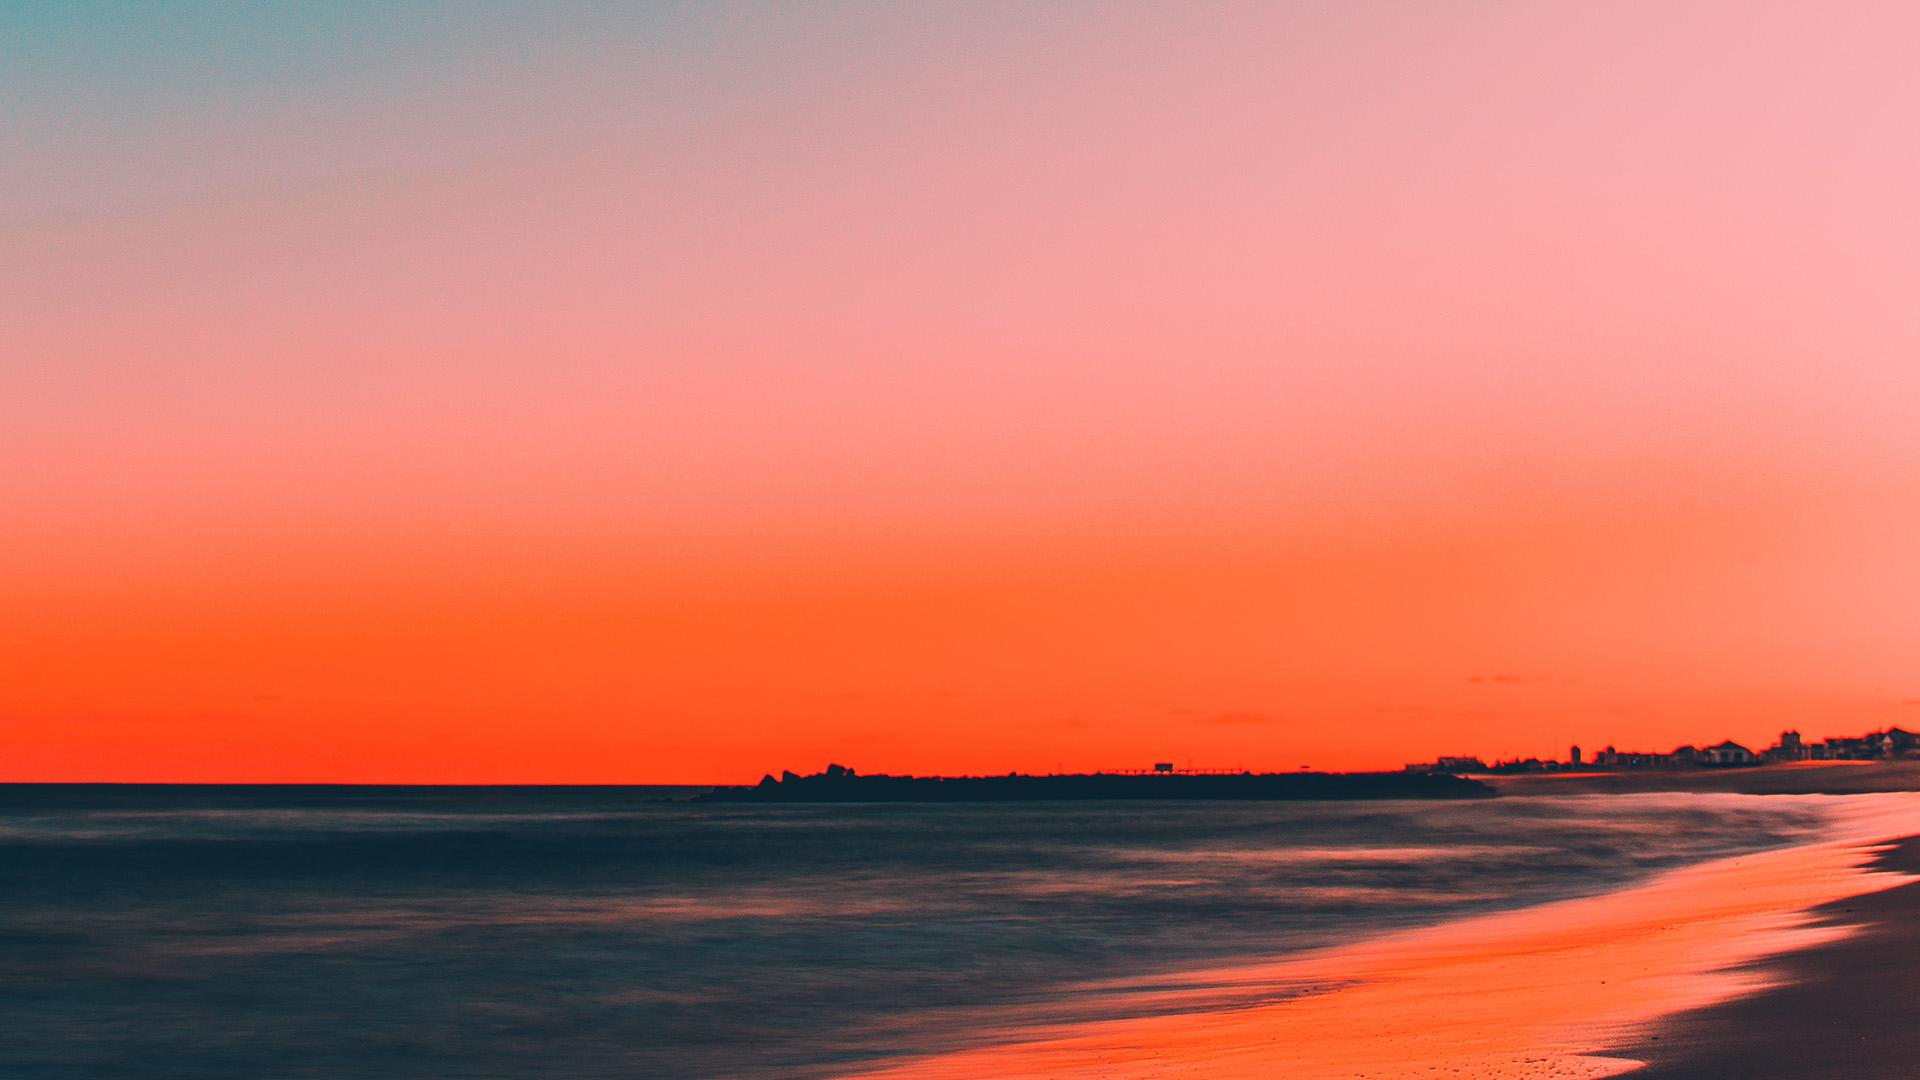 California Wallpaper Iphone 7 Nu77 Sunset Beach Fall Night Sea Nature Wallpaper